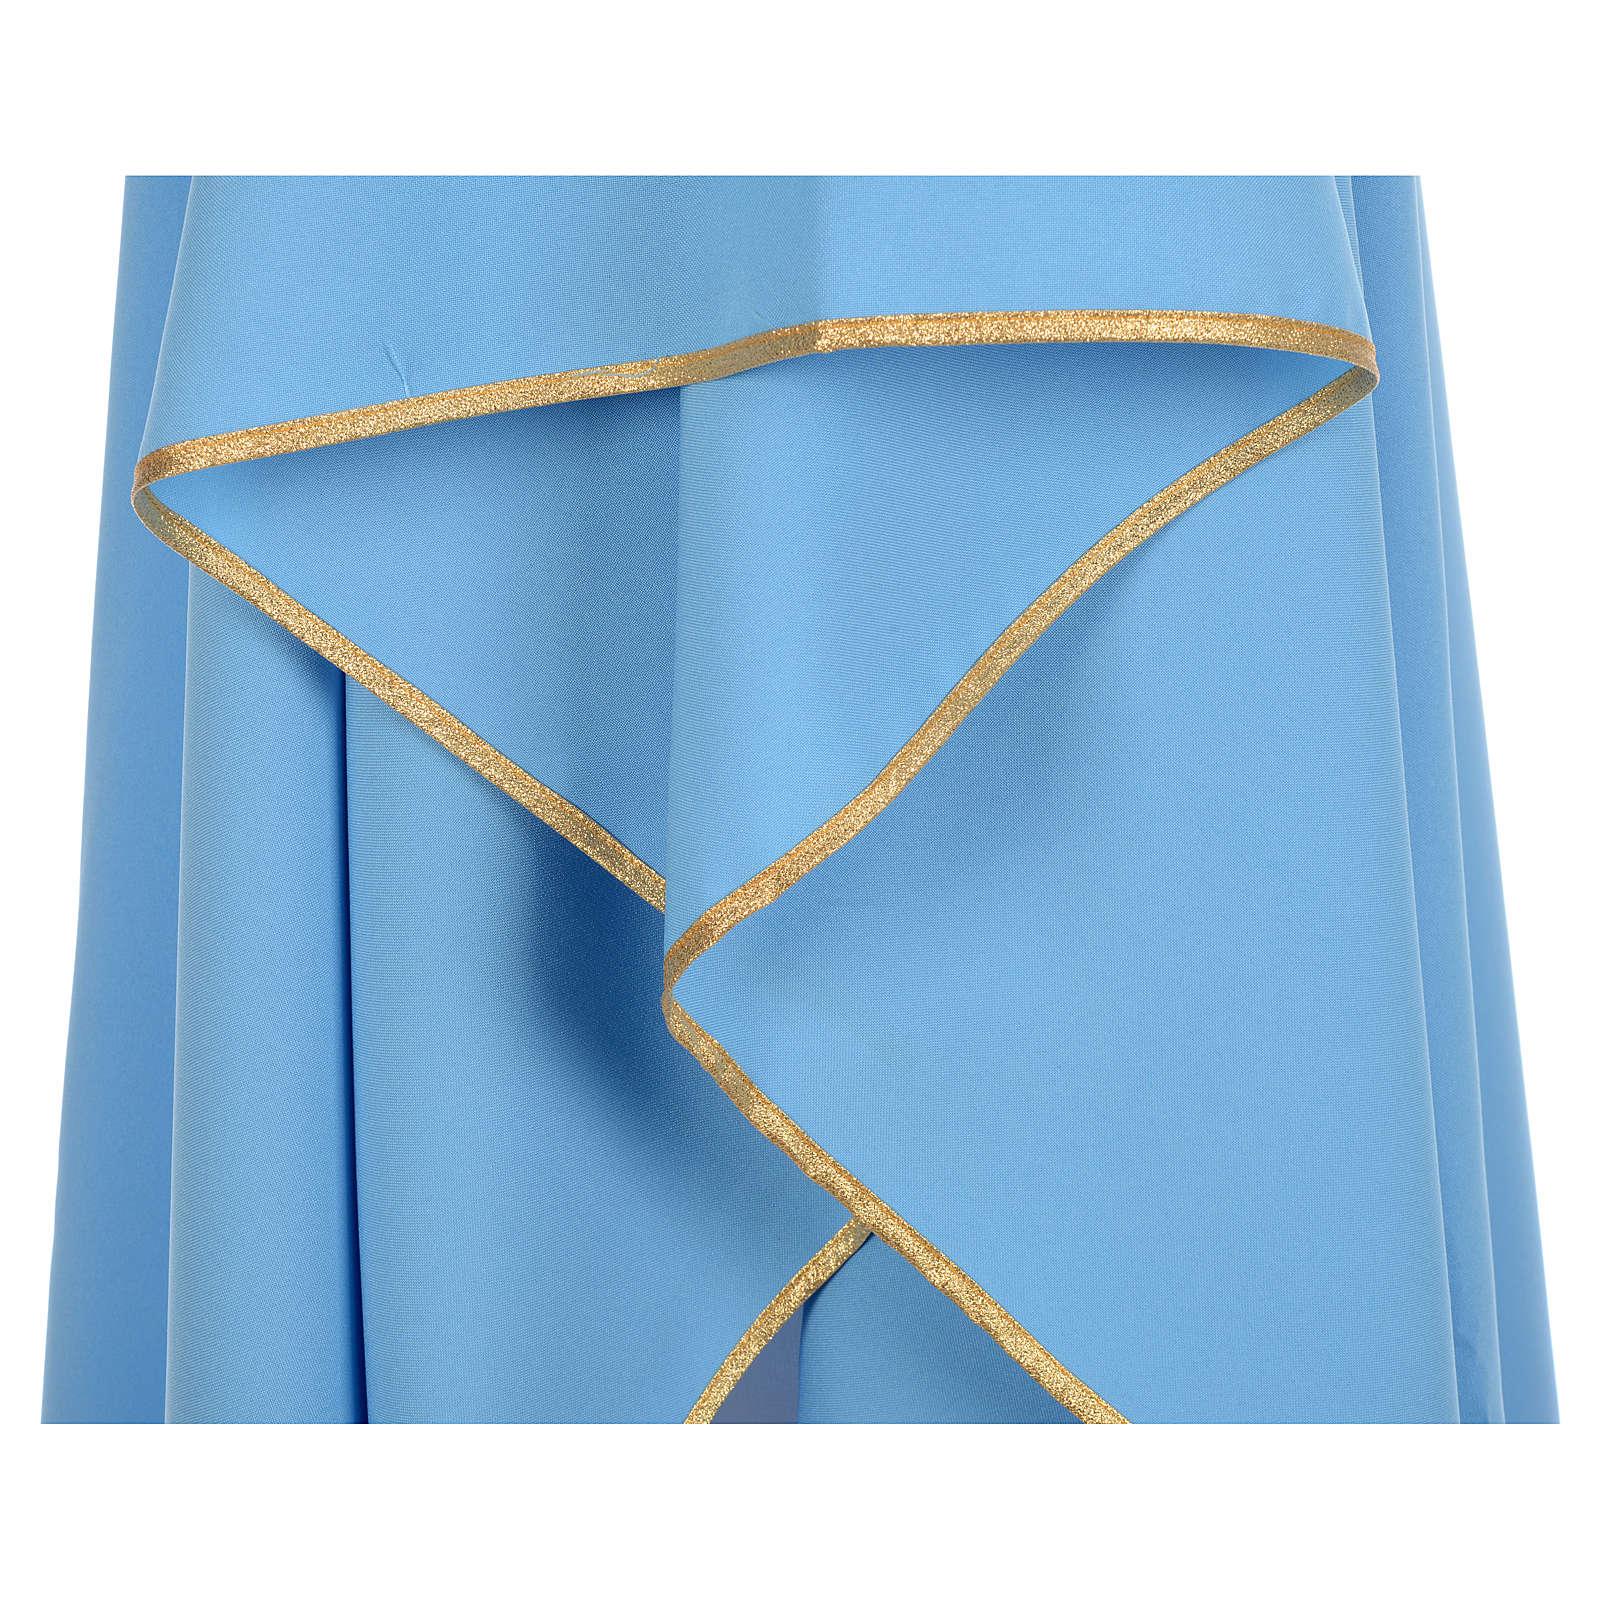 Azurblaue Kasel 100% blanker Polyester XP 4